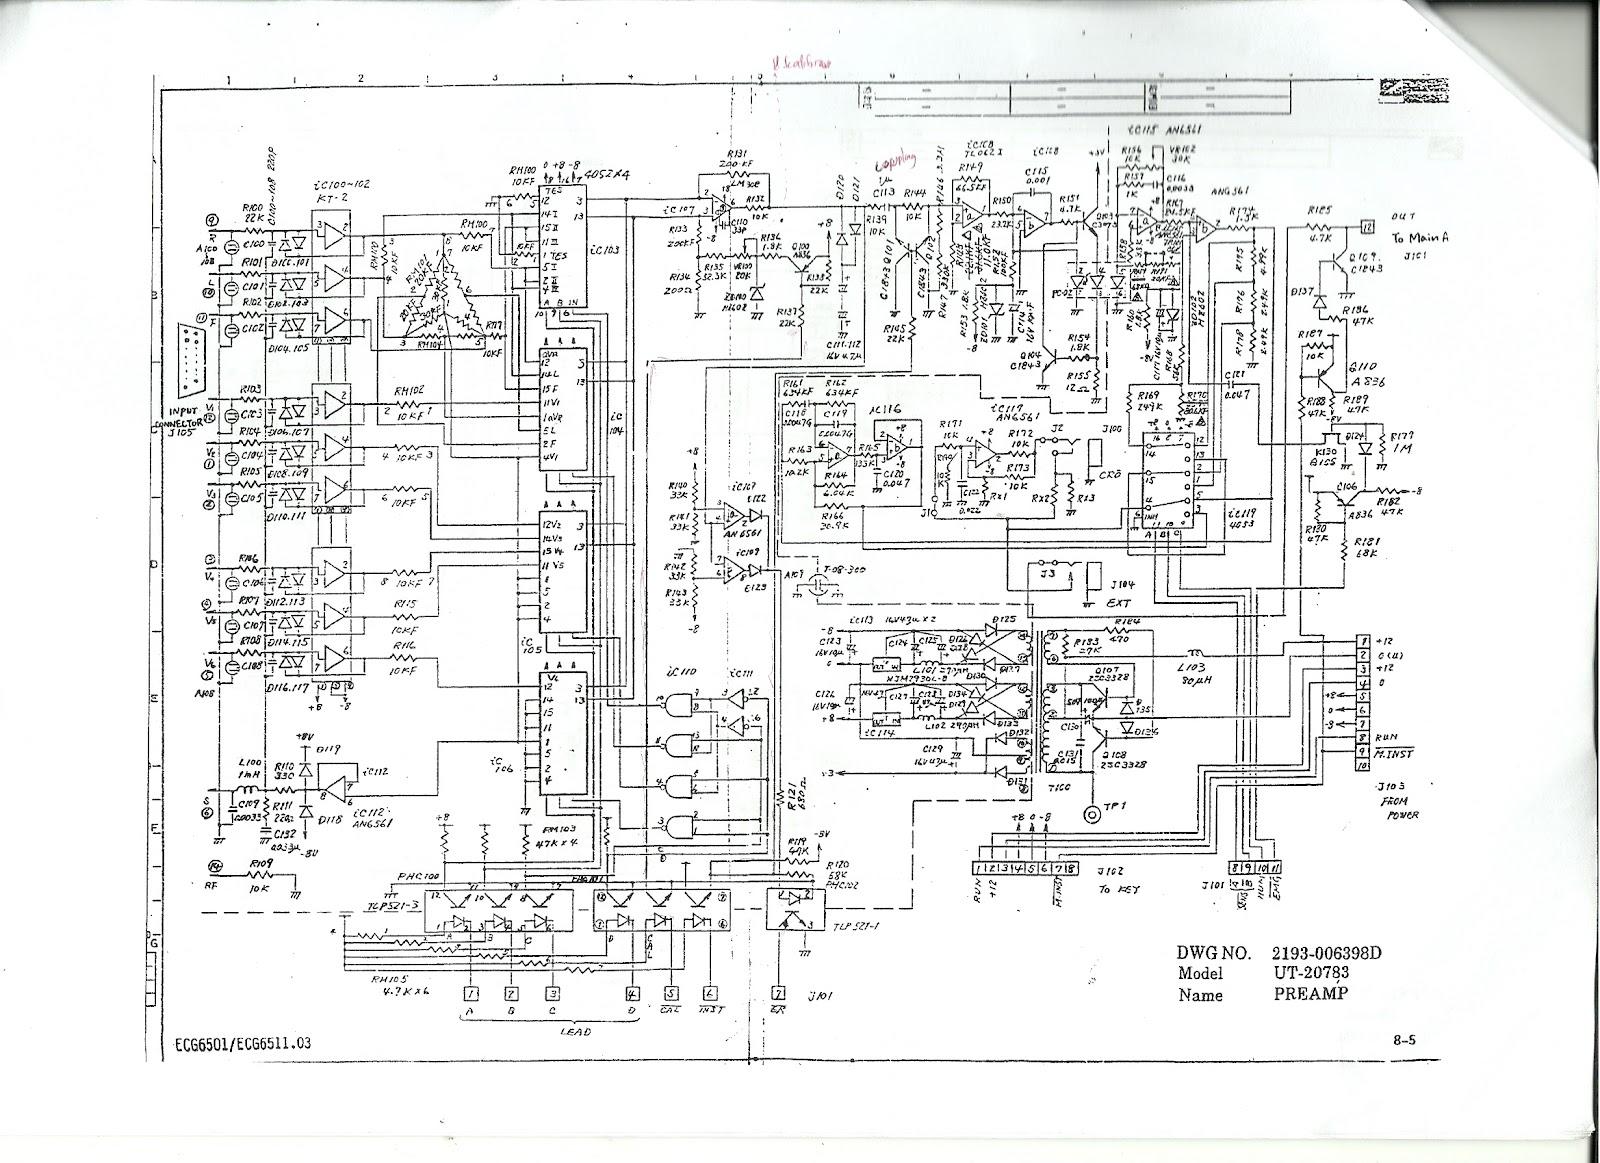 hight resolution of ekg wiring diagram guide about wiring diagram wiring diagram engine 99 taurus wiring diagram ecg